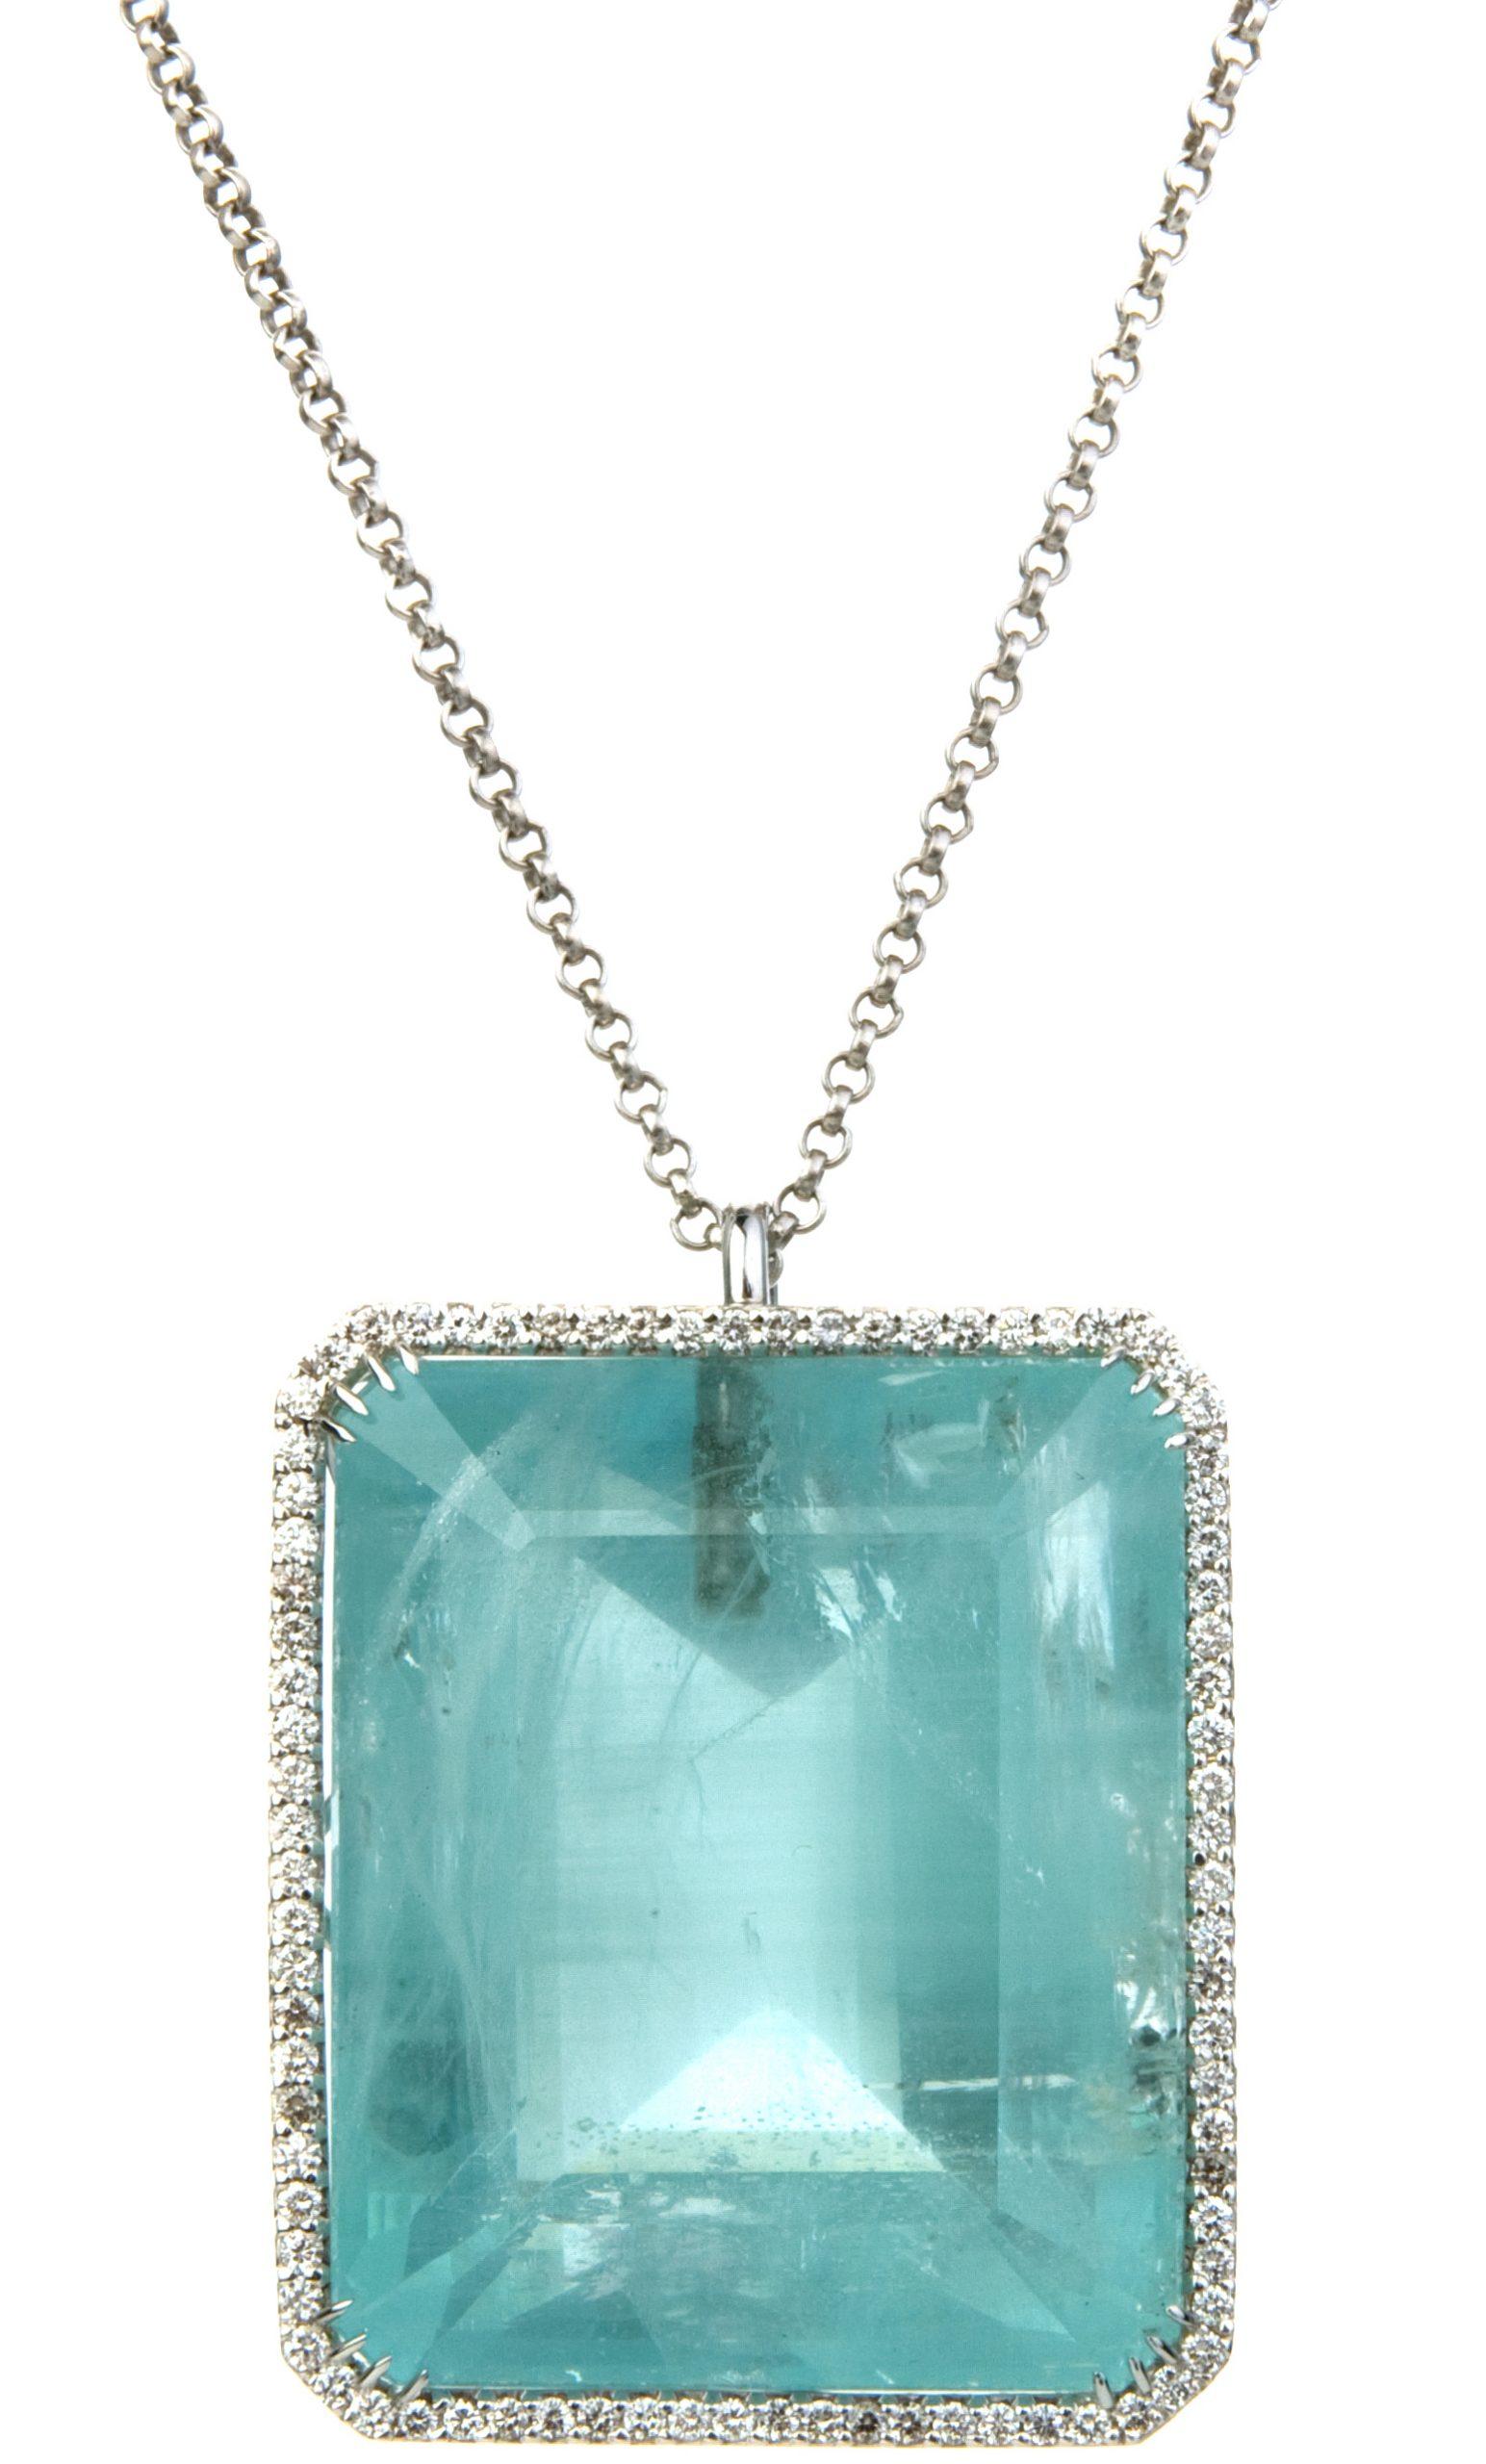 Kimberly McDonald 150ct Aquamarine Pendant with 1.55cts Diamond Bezel in 18k White Gold on Platinum Chain with Black Rhodium